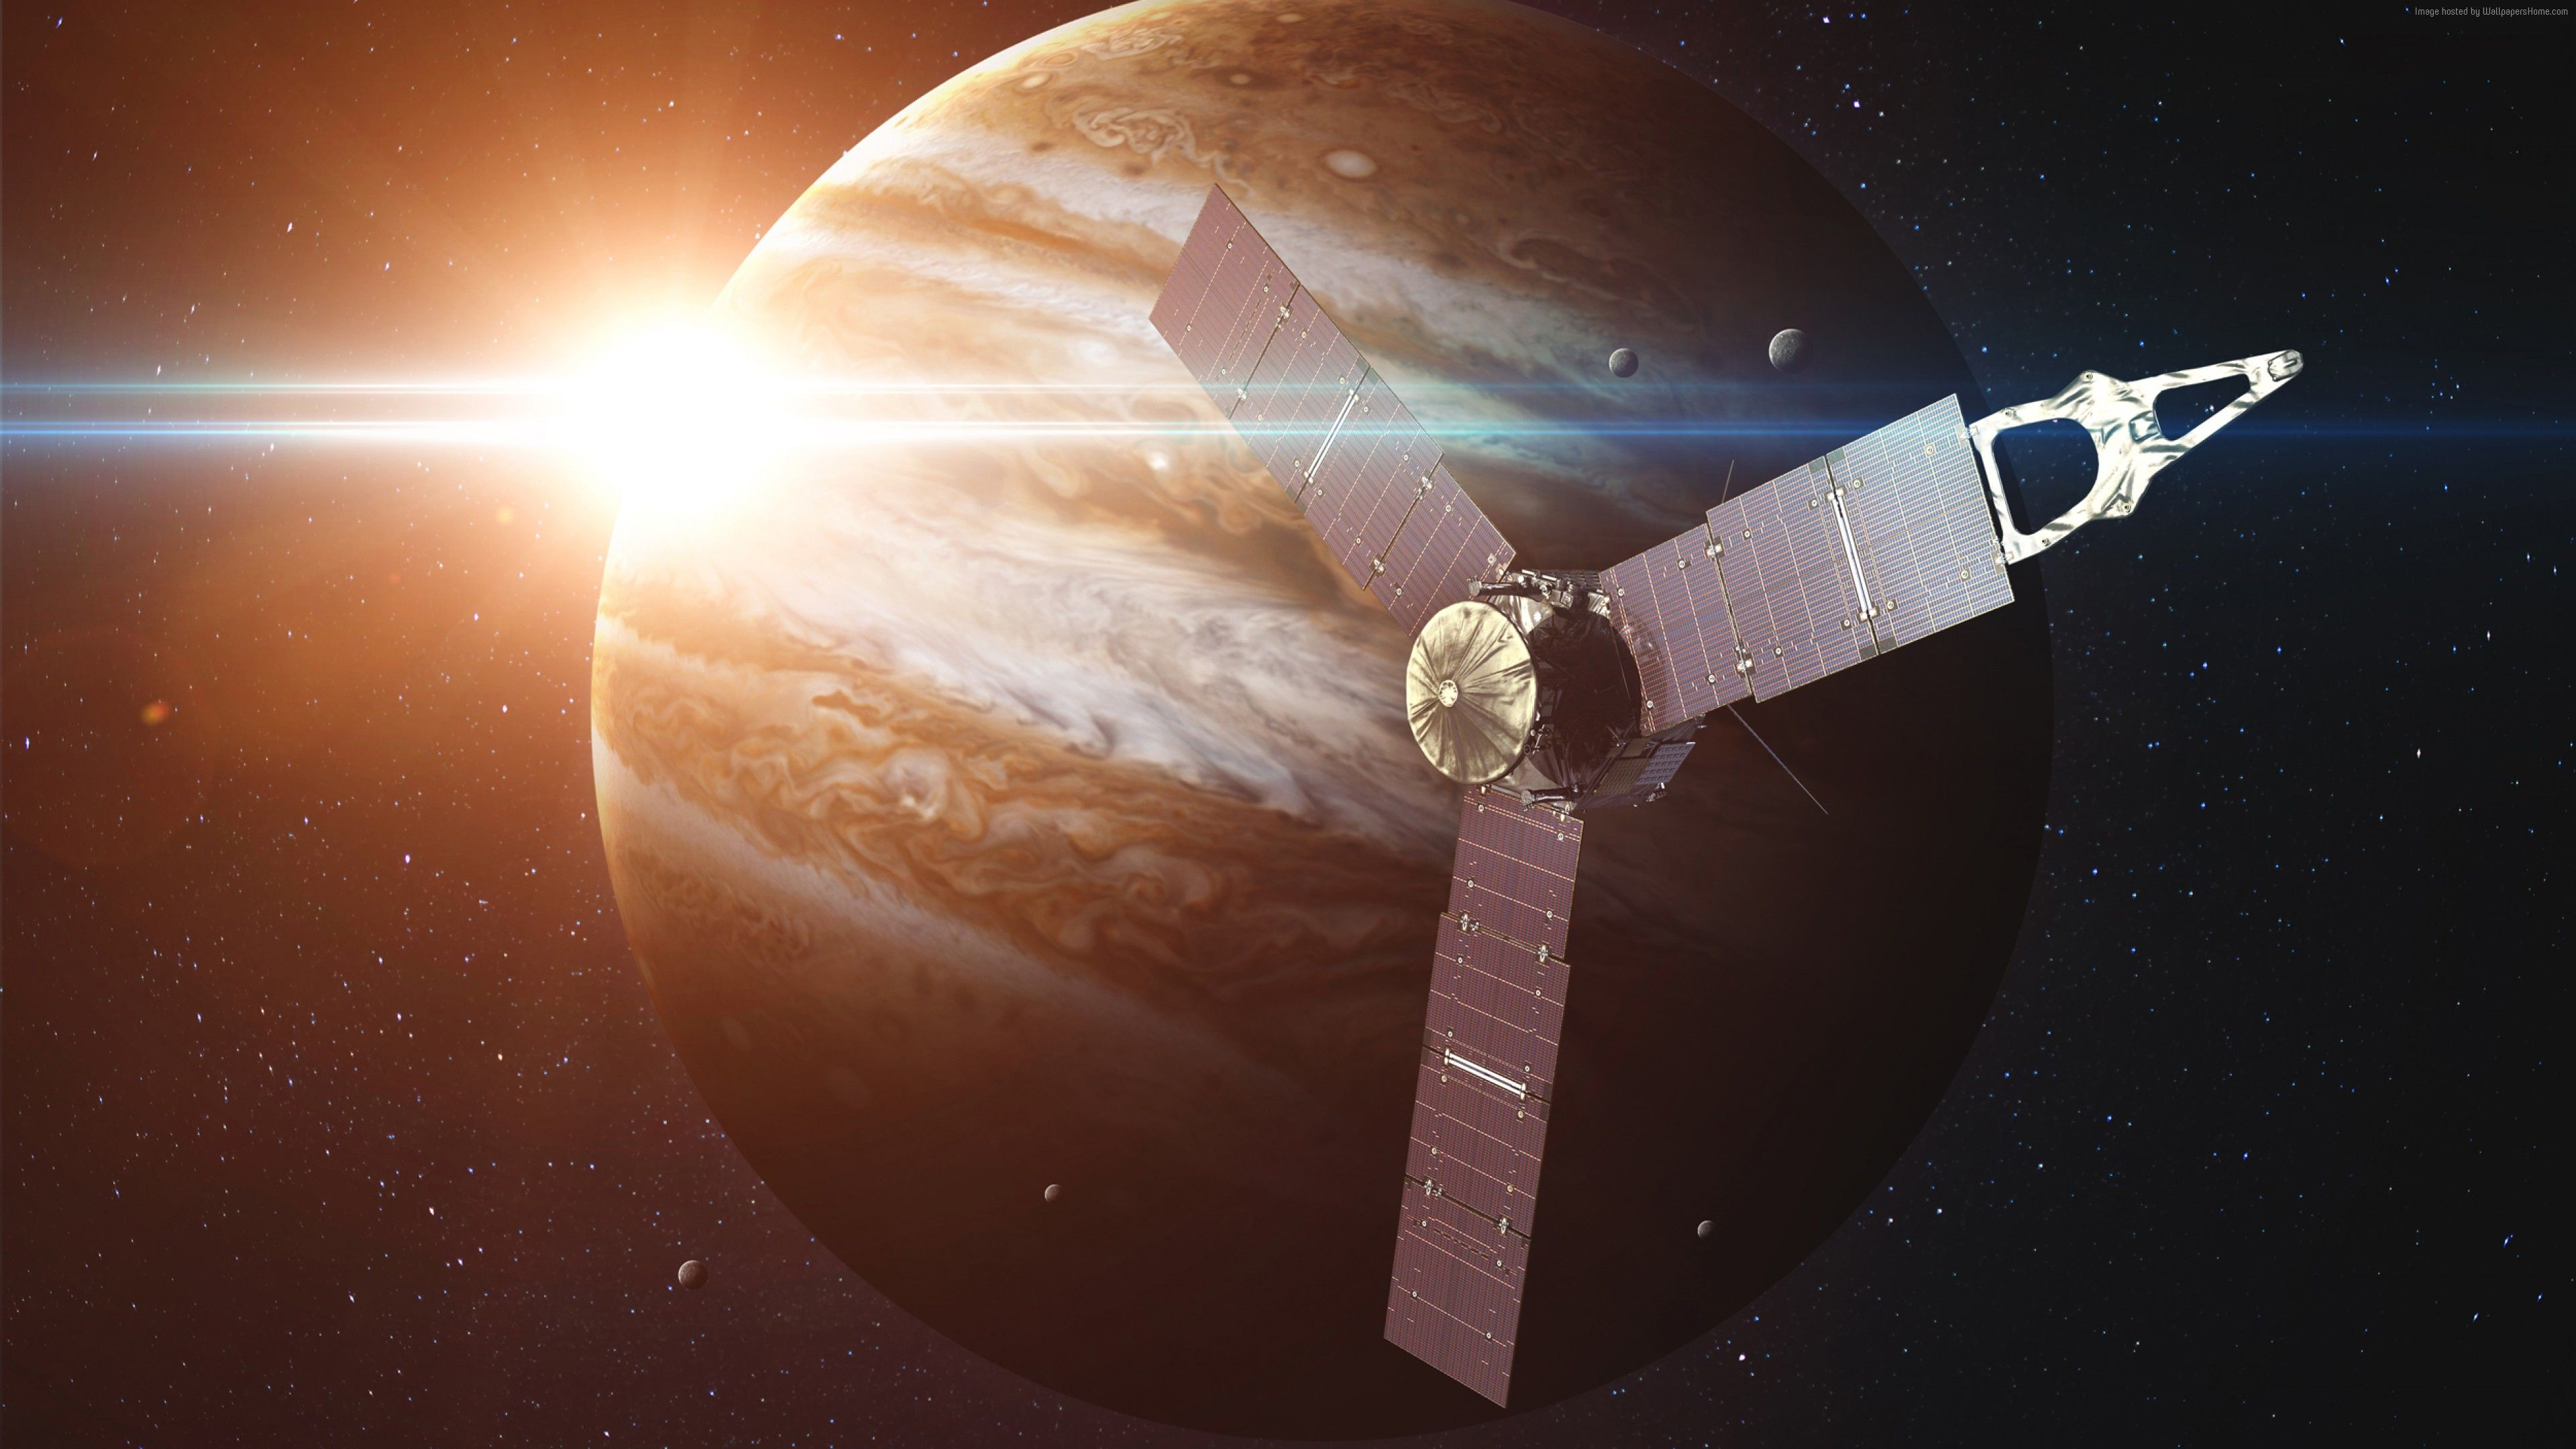 Wallpaper Jupiter Juno 4k Hd Nasa Space Photo Planet Art Space Http Www Wallpaperback Net Space W Jupiter Wallpaper Galaxy Planets Planets Wallpaper